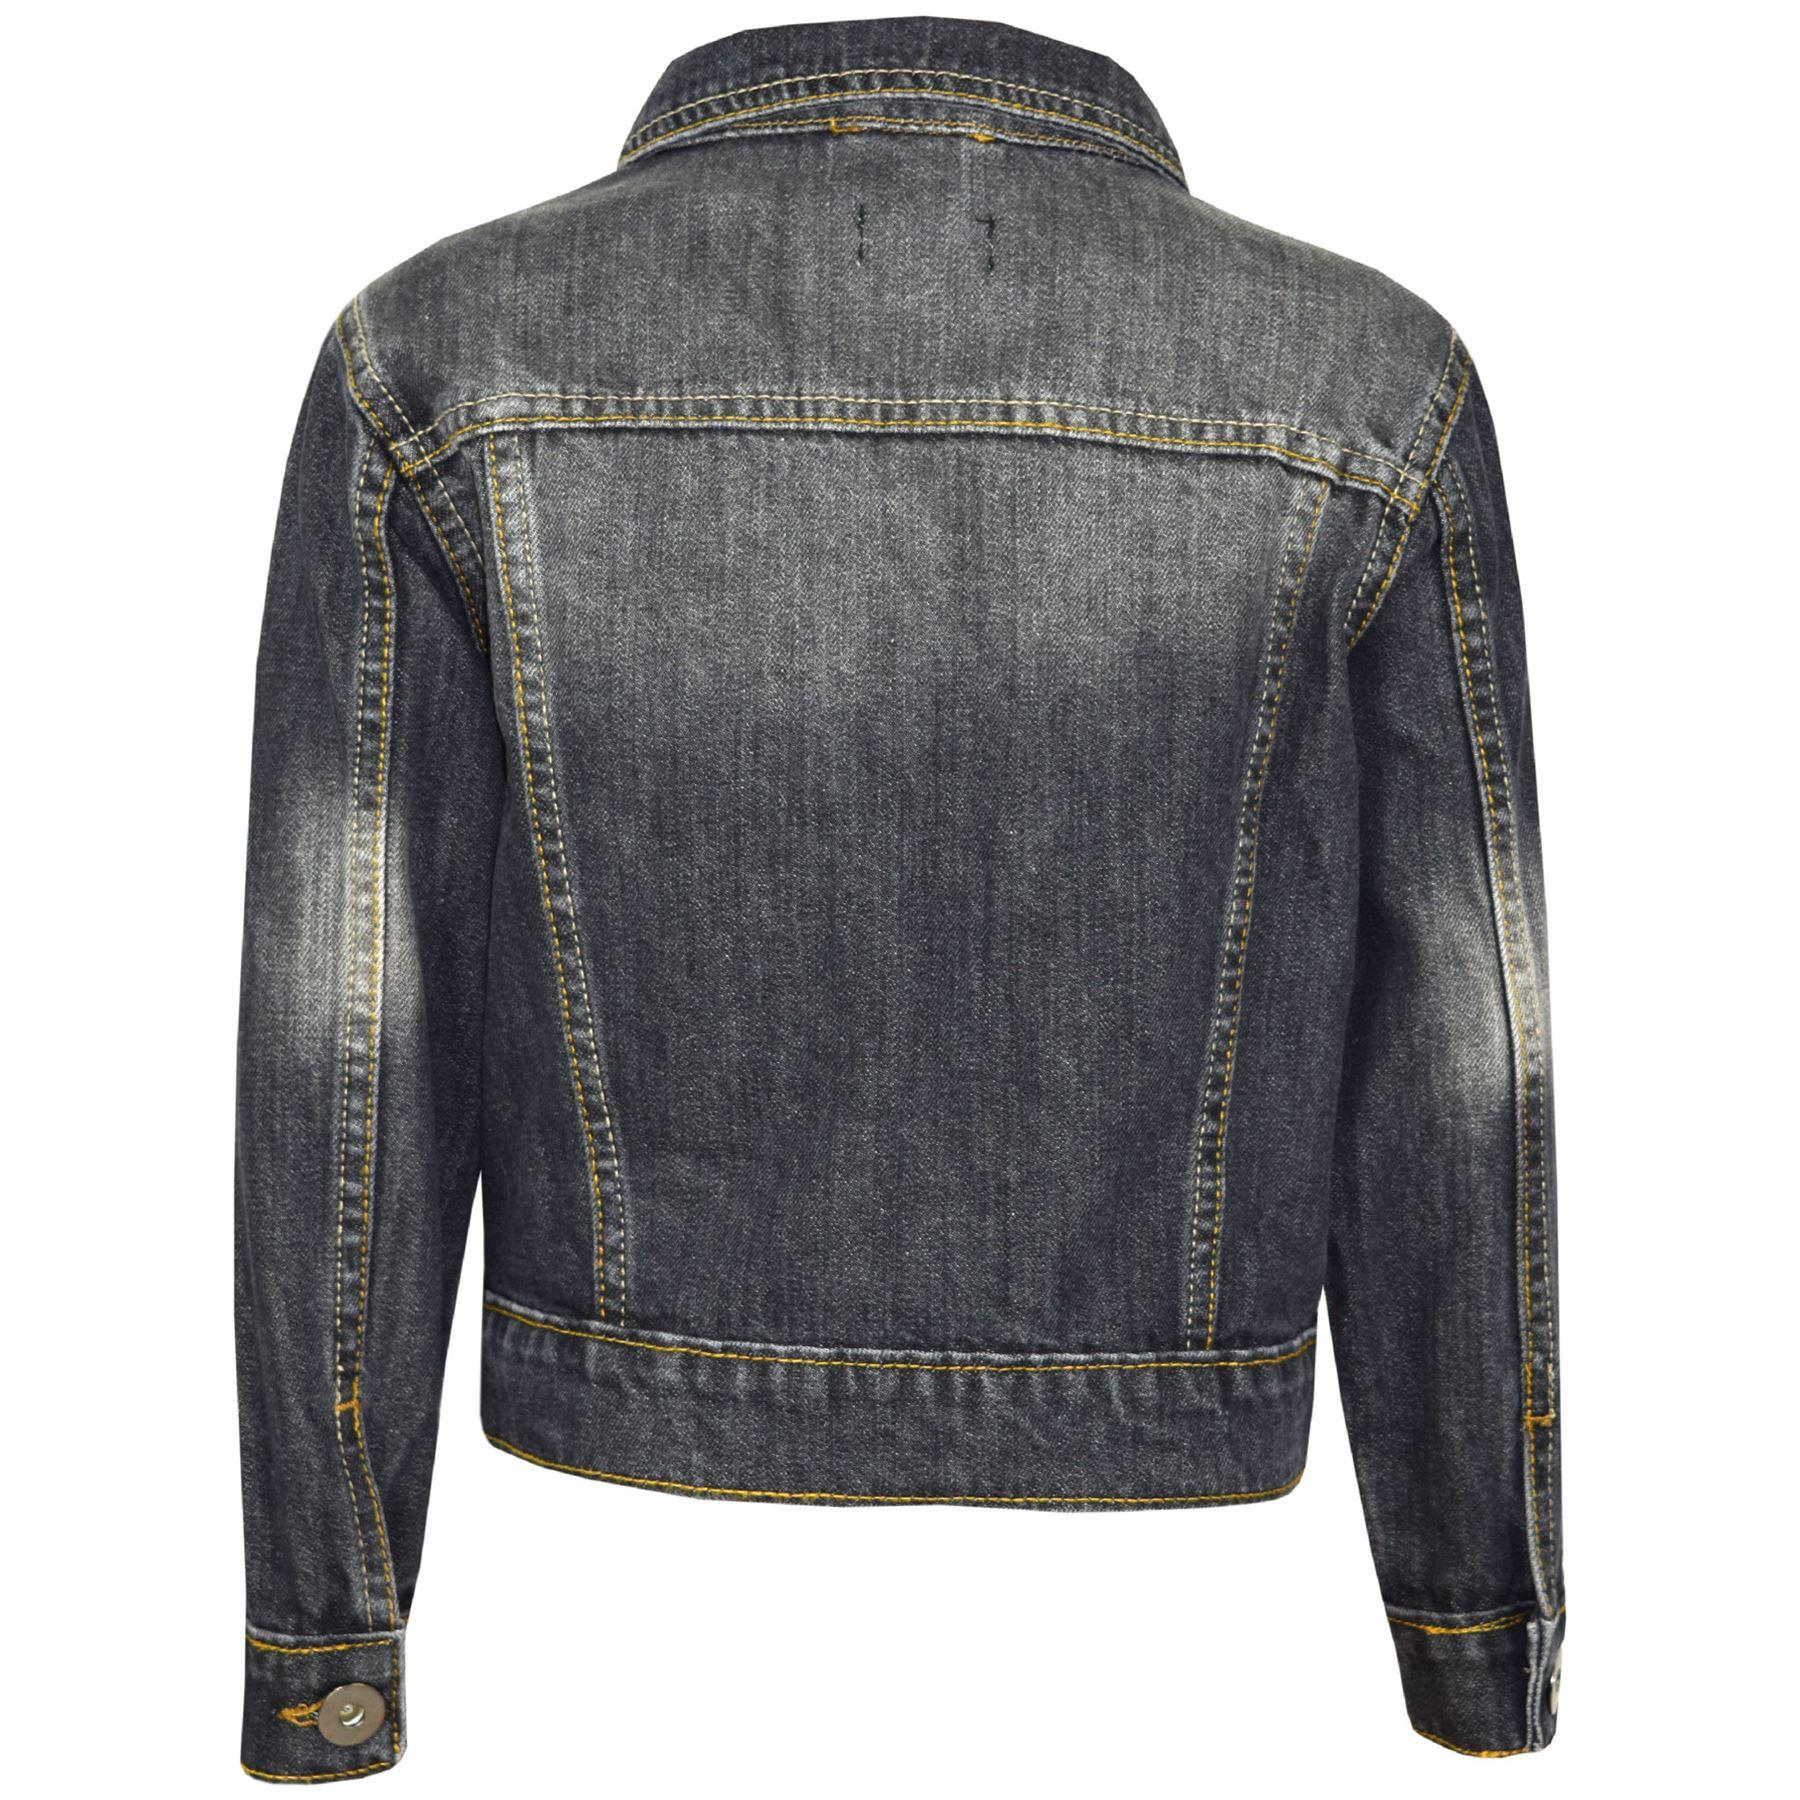 Kids Girls Jackets Designer Denim Style Fashion Black Jeans Jacket Coats 3-13 Yr